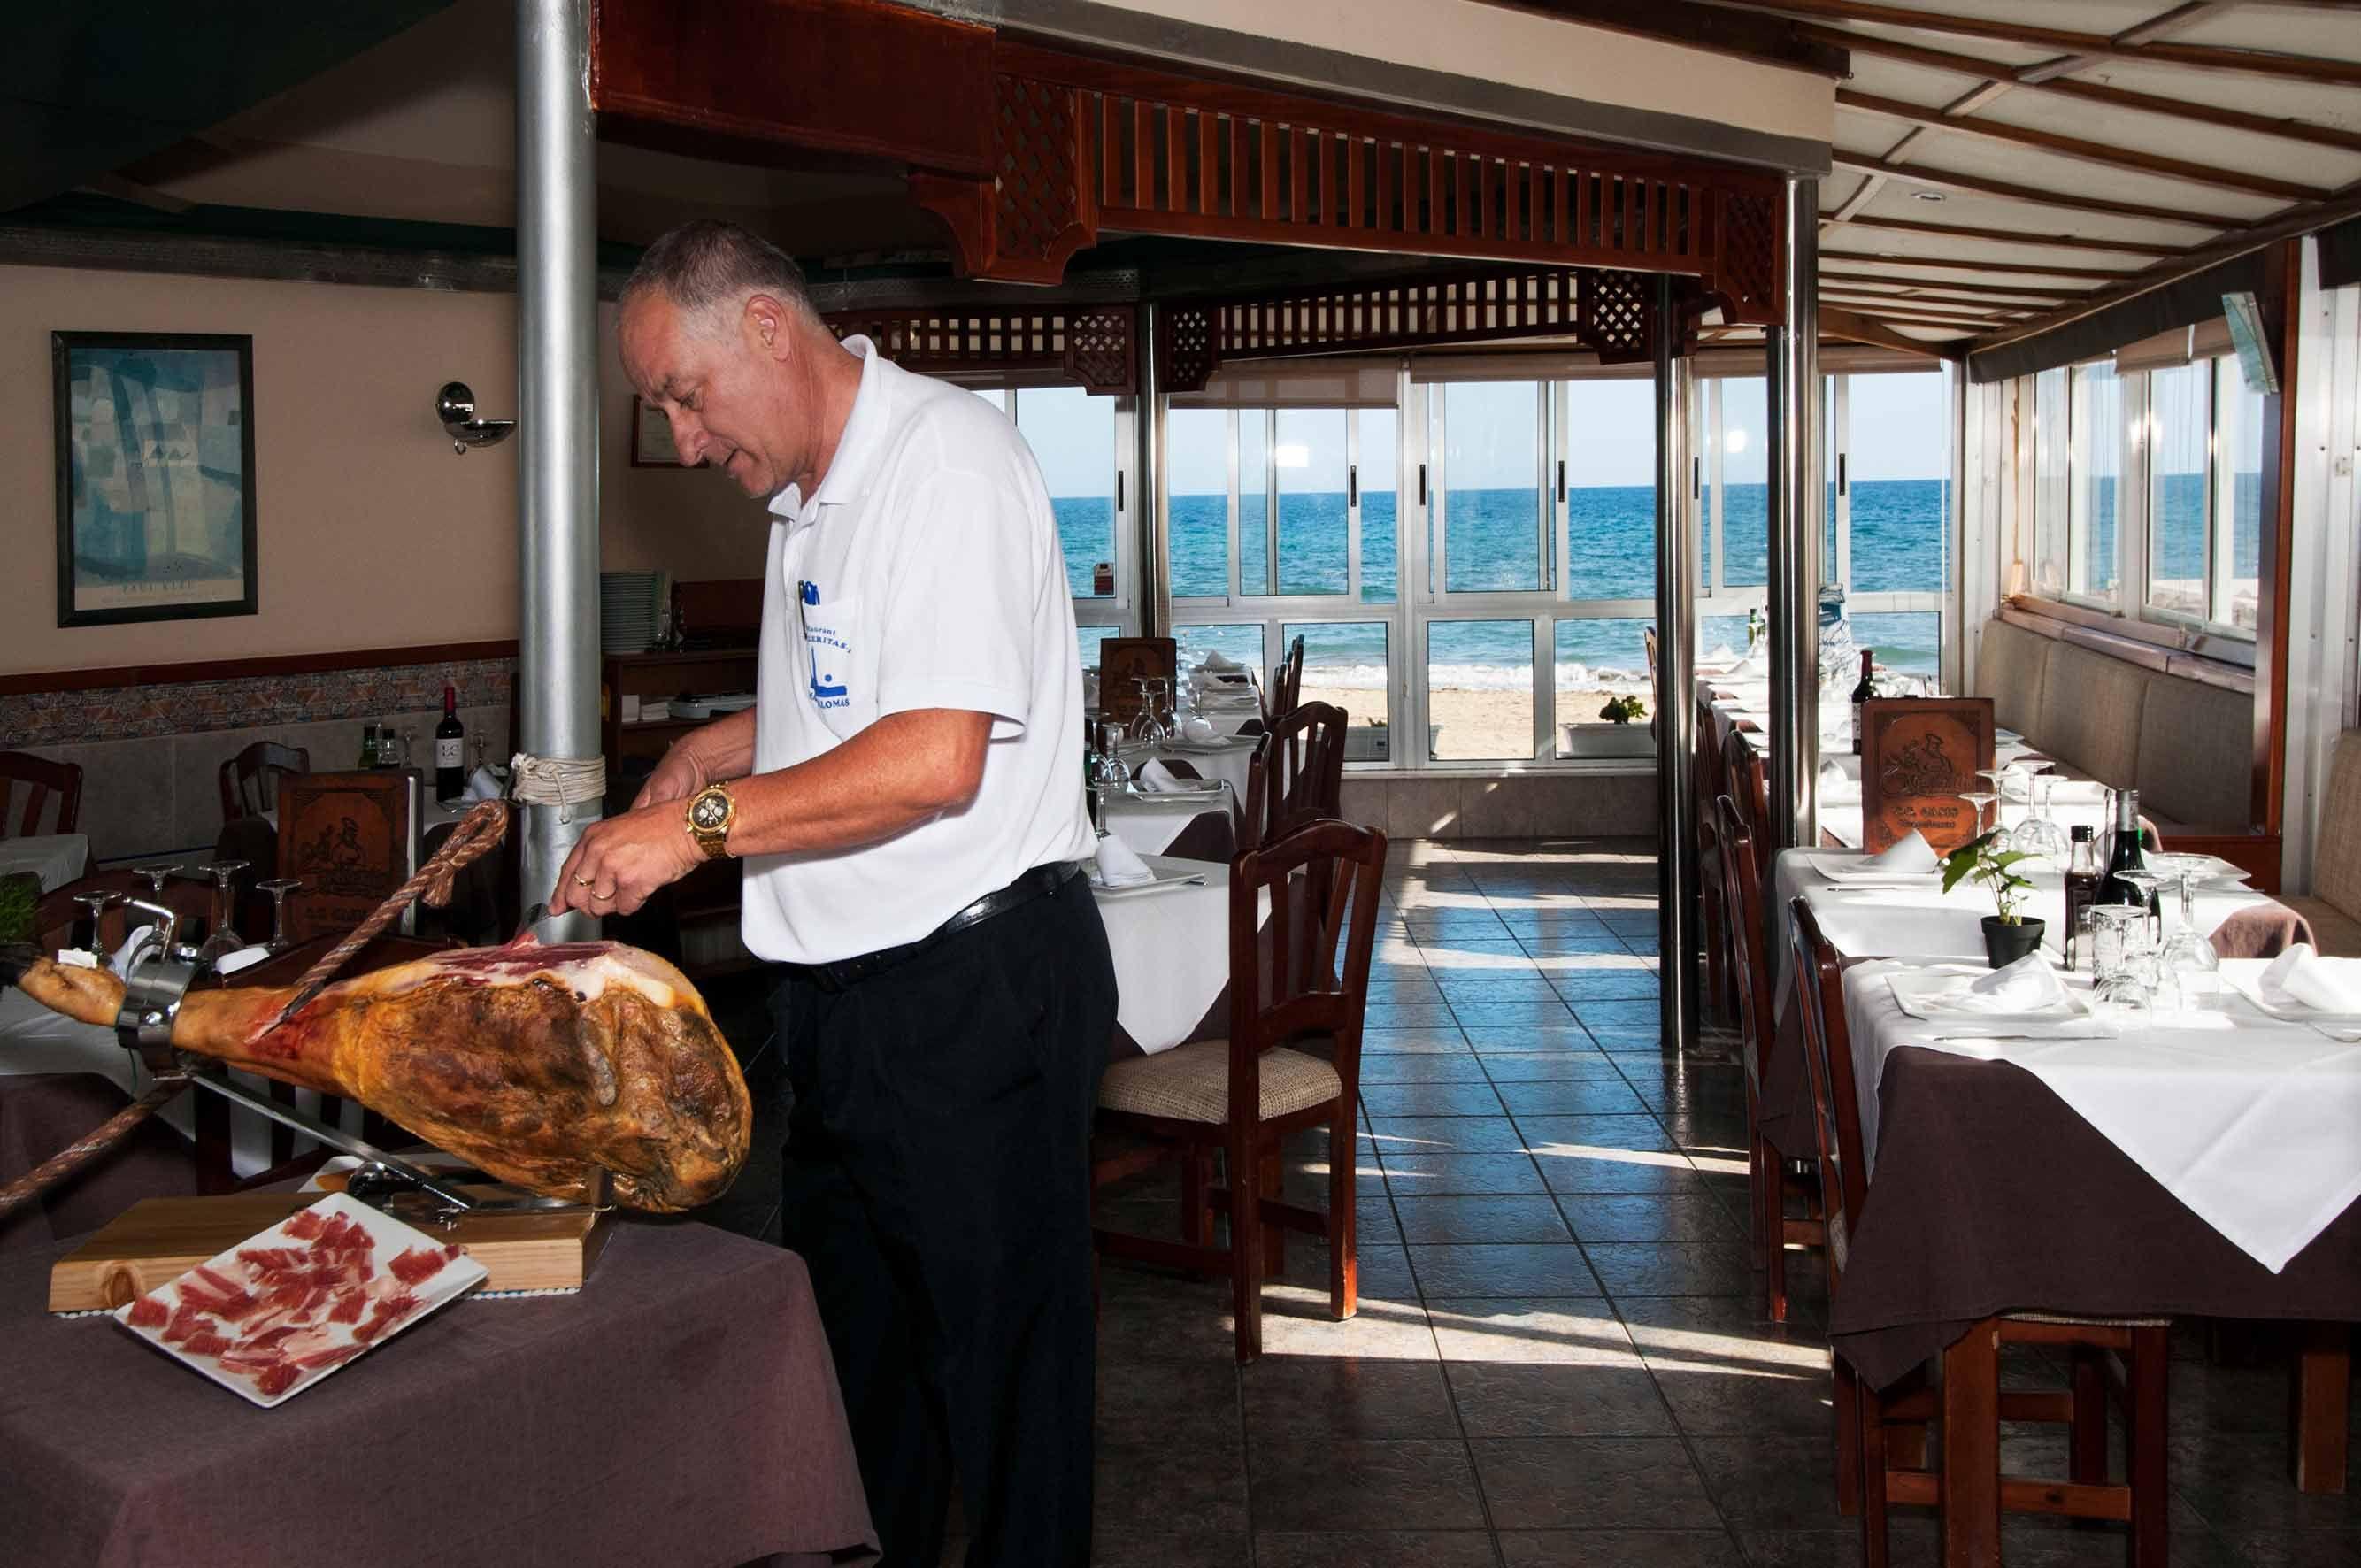 Foto 10 de Cocina internacional en San Bartolomé de Tirajana | Restaurante Escaleritas